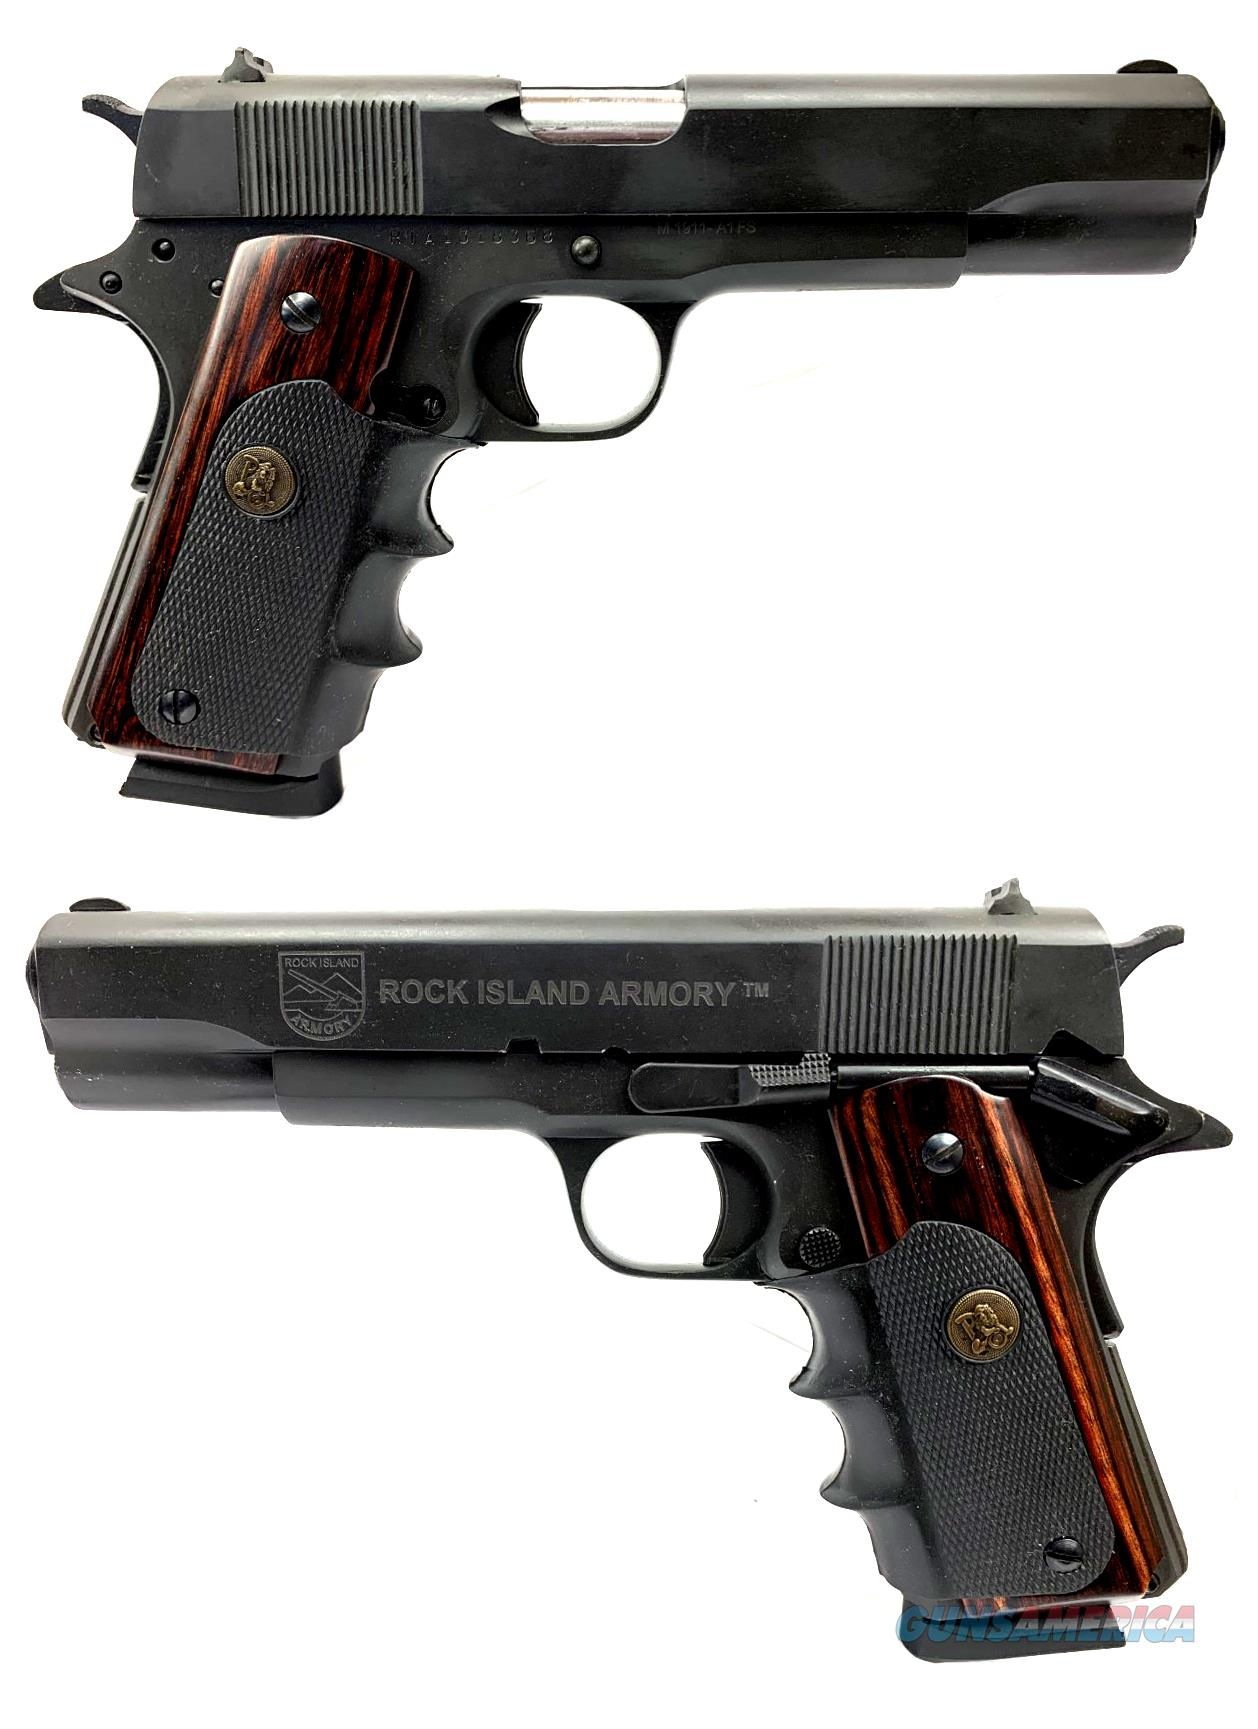 Rock Island Armory M1911-A1FS .45ACP Semi-Automatic Pistol  Guns > Pistols > Rock Island Armory Pistols > Rock Island